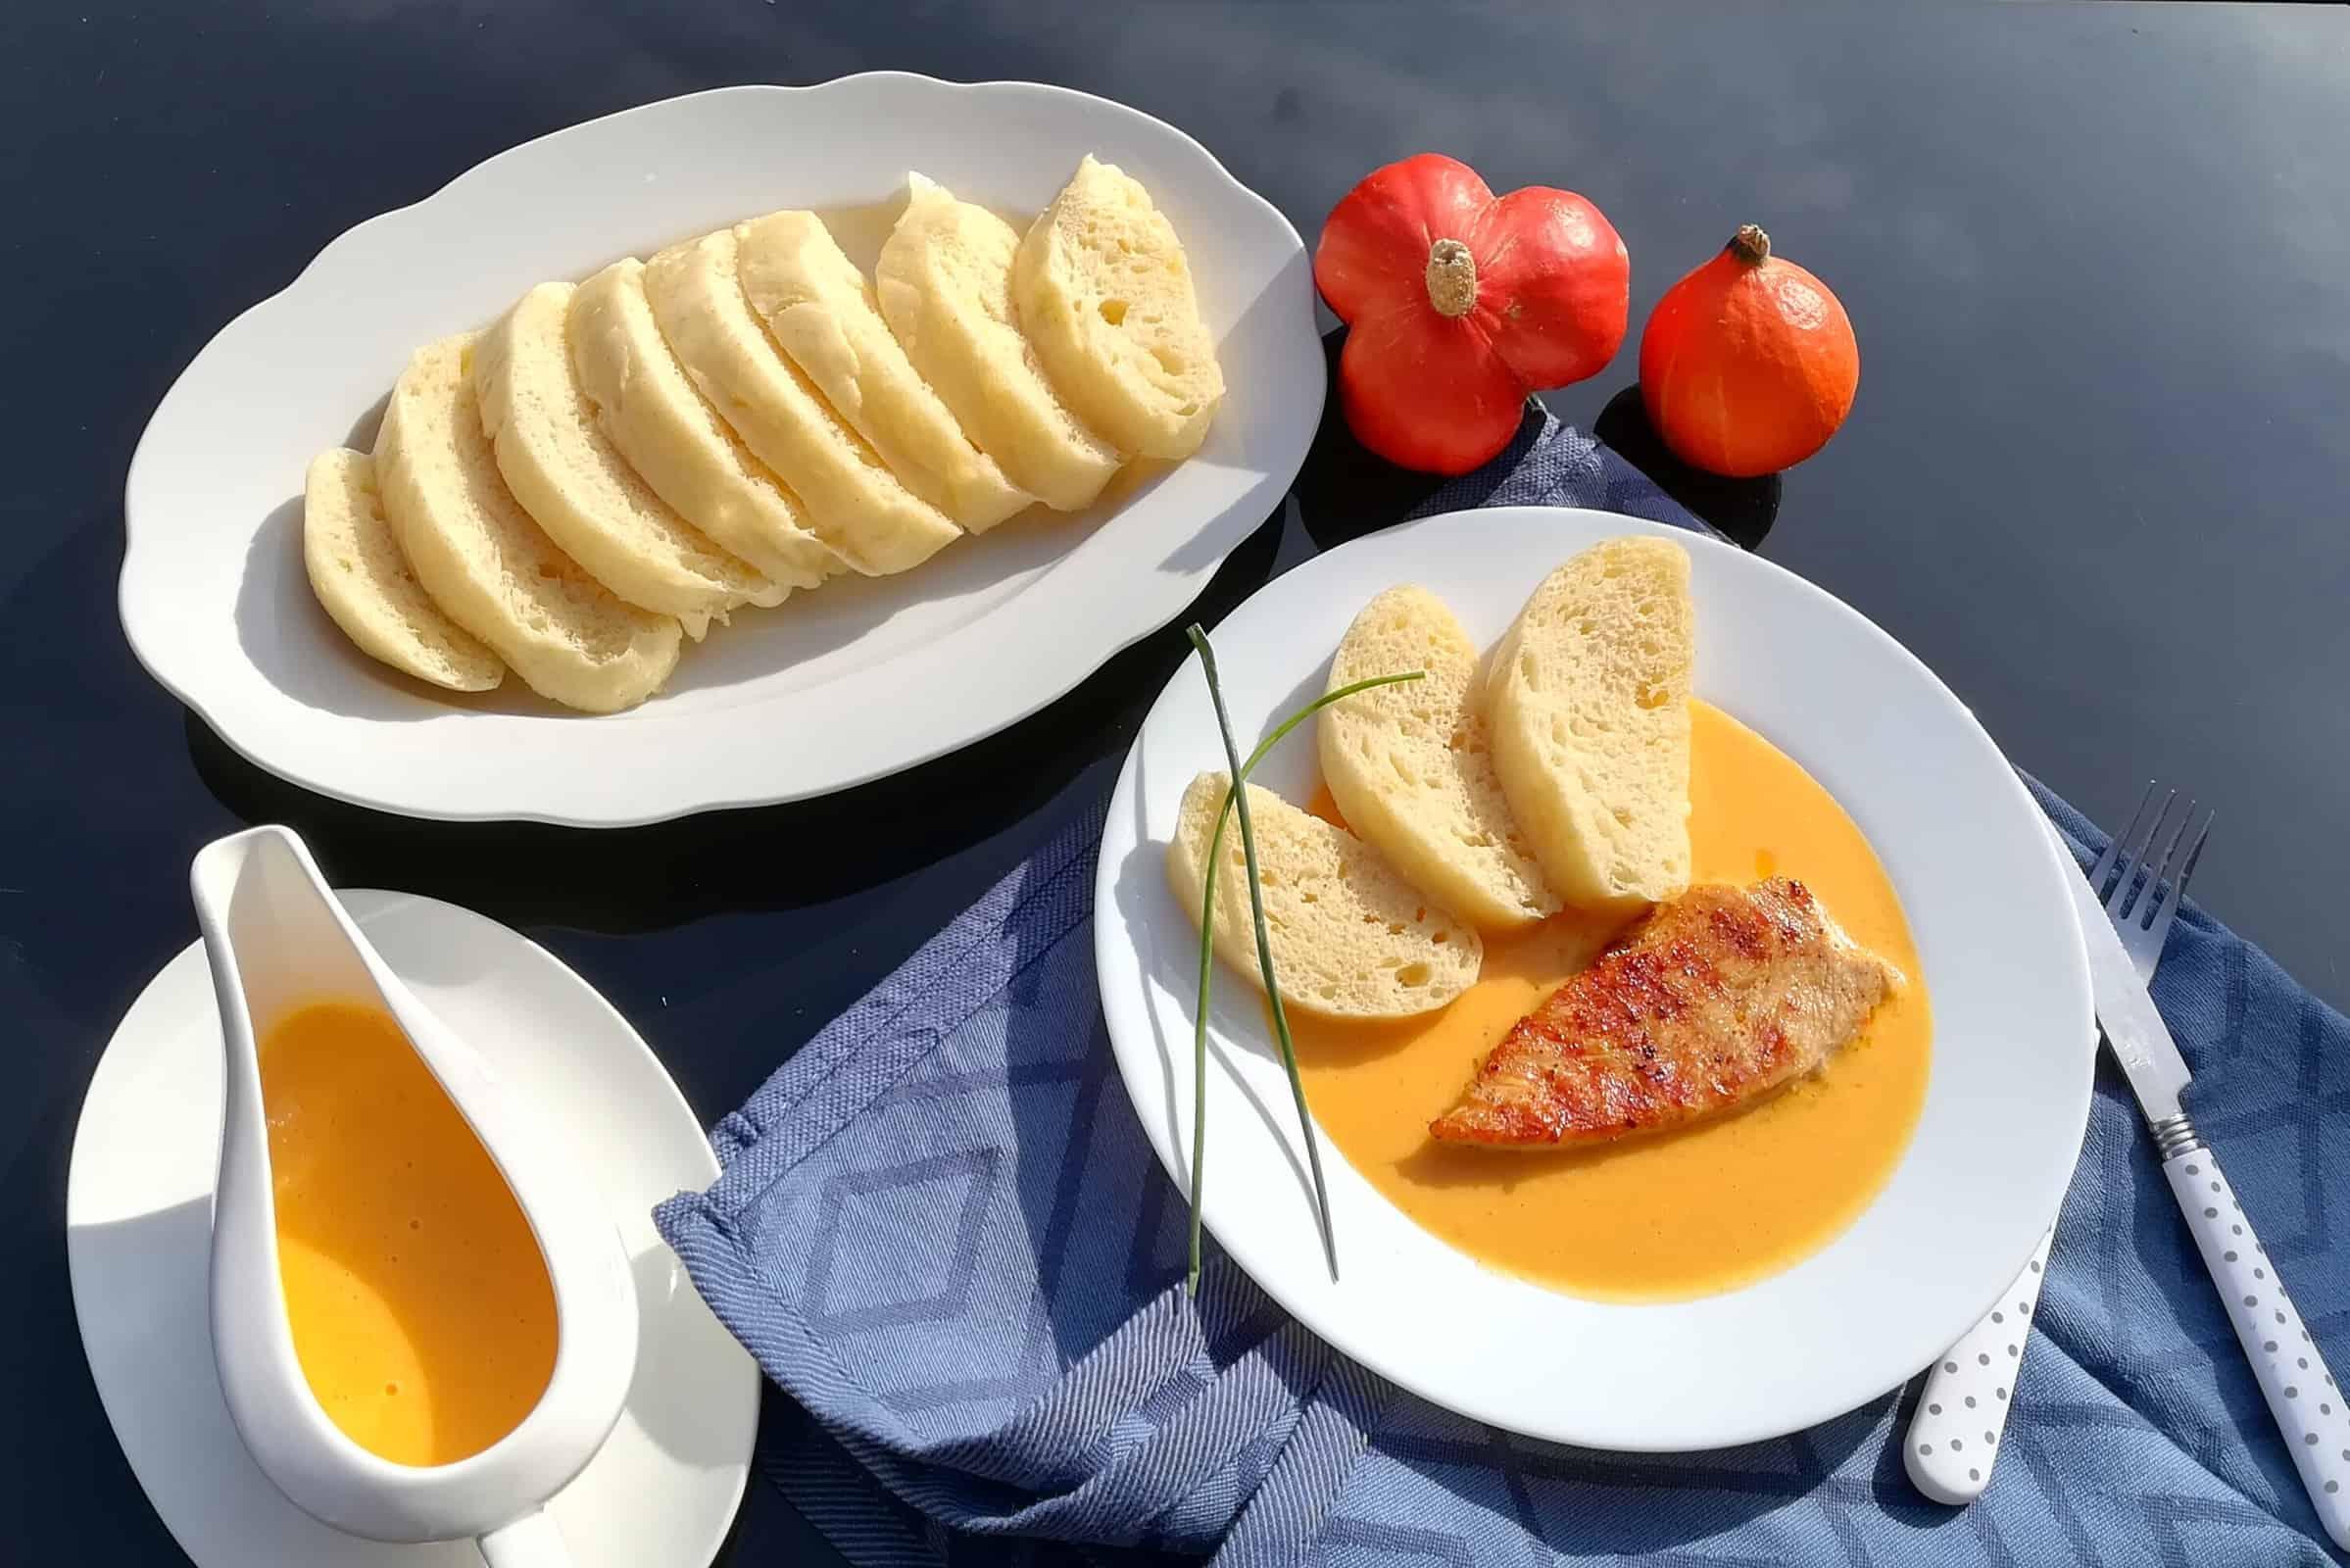 Tekvicová omáčka s grilovanými morčacími prsiami a domácou knedlou